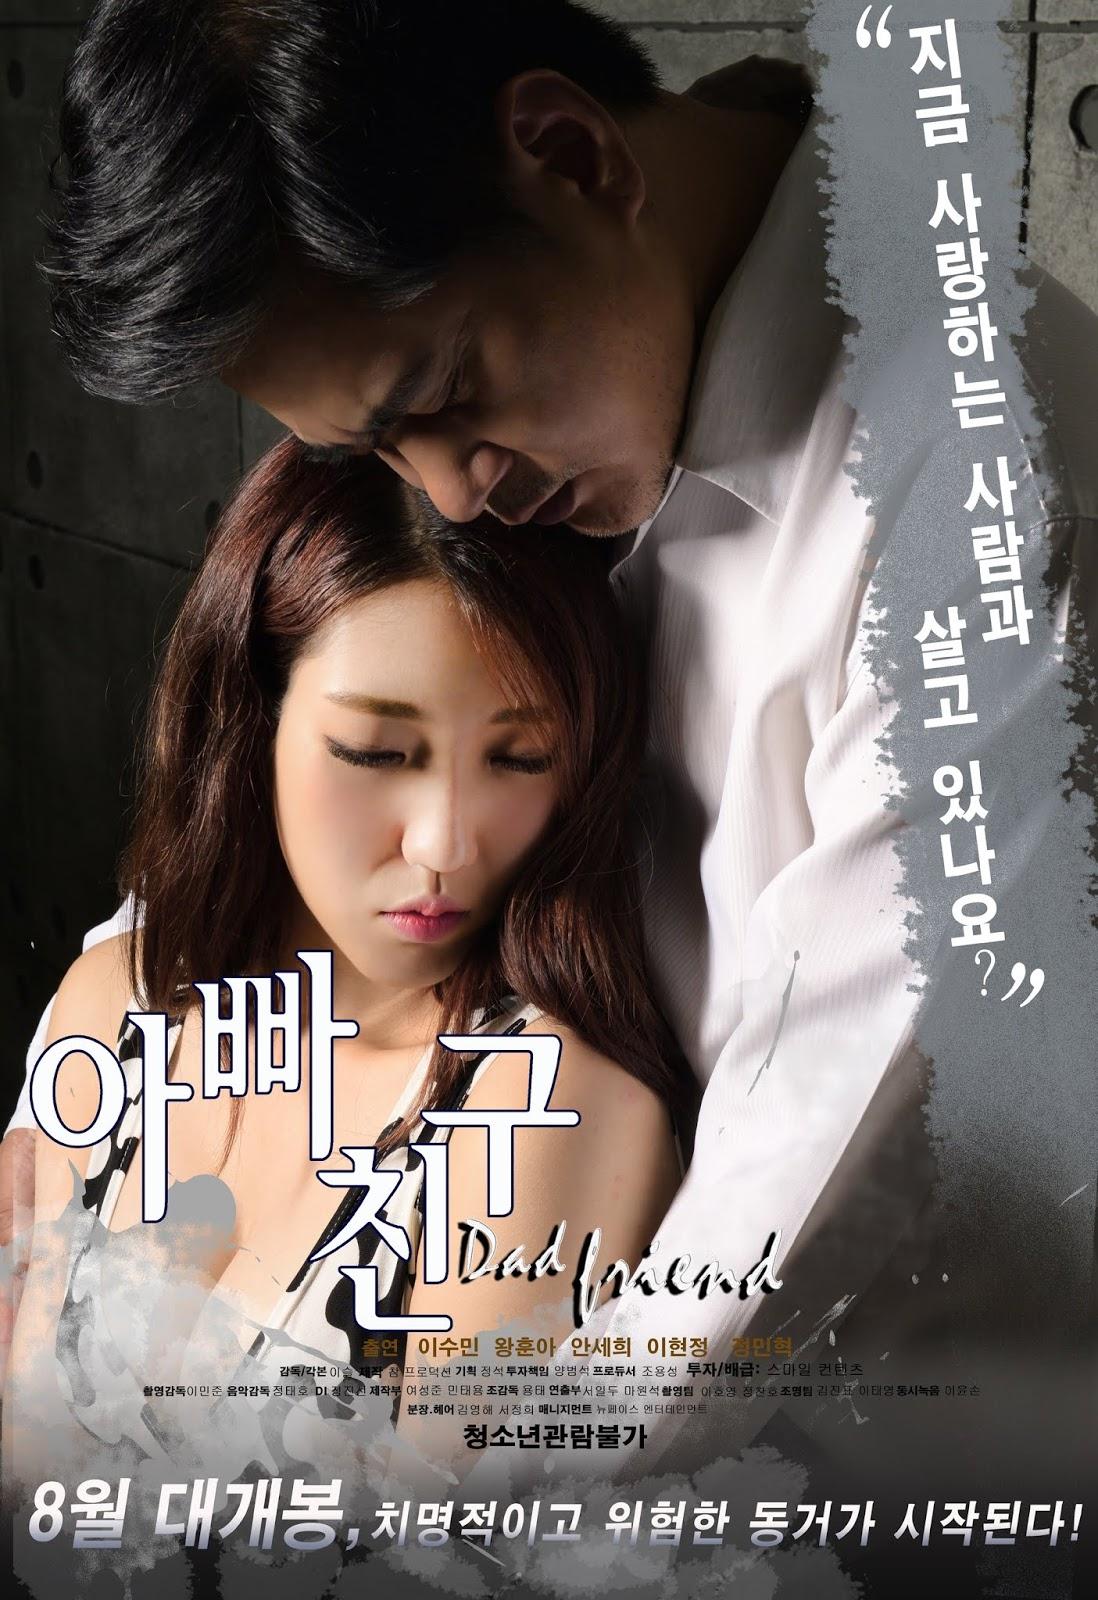 Dad's Friend Full Korea 18+ Adult Movie Online Free